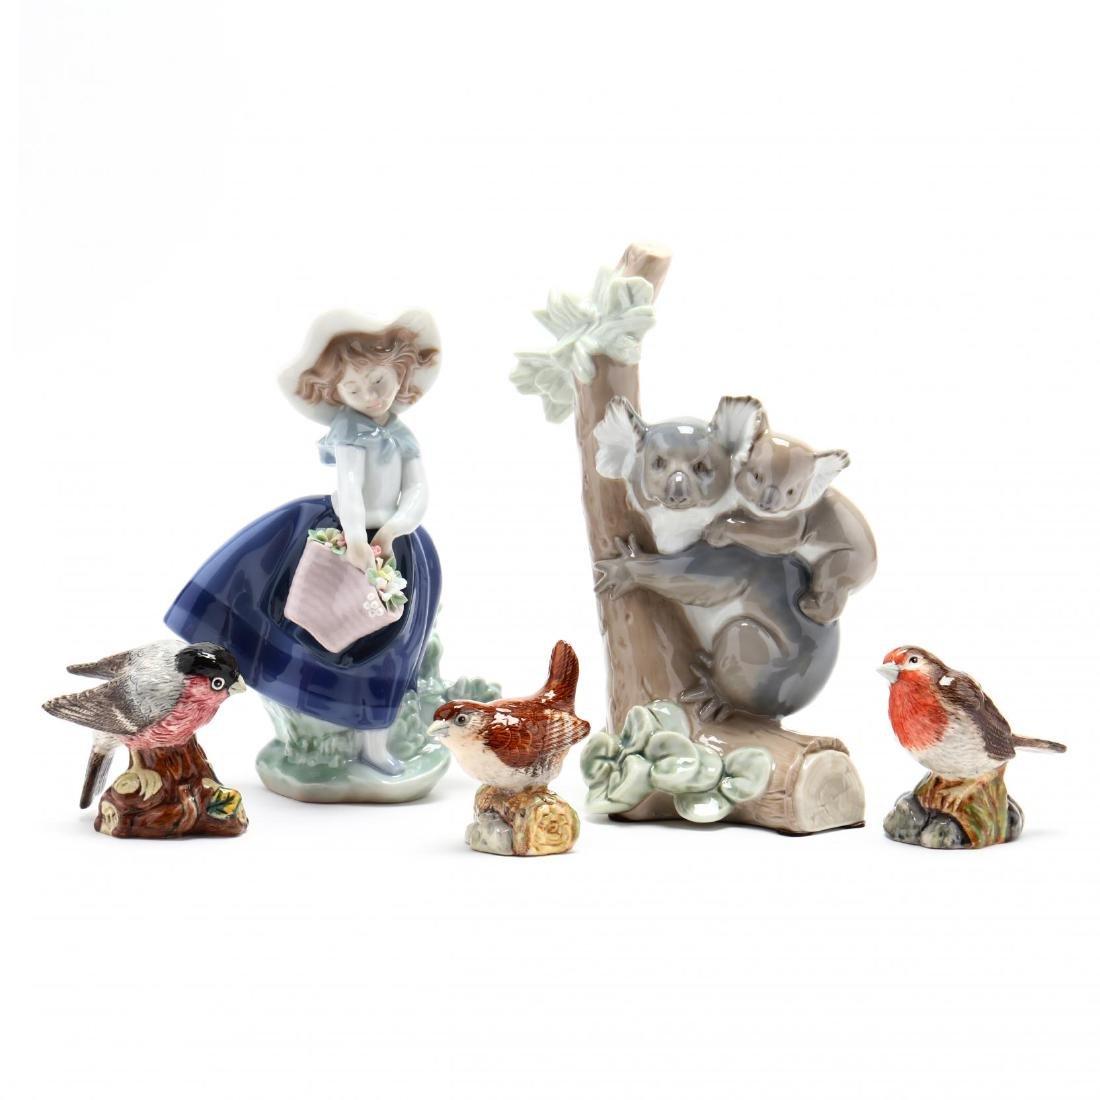 Five Porcelain Figures, Lladro and Royal Doulton